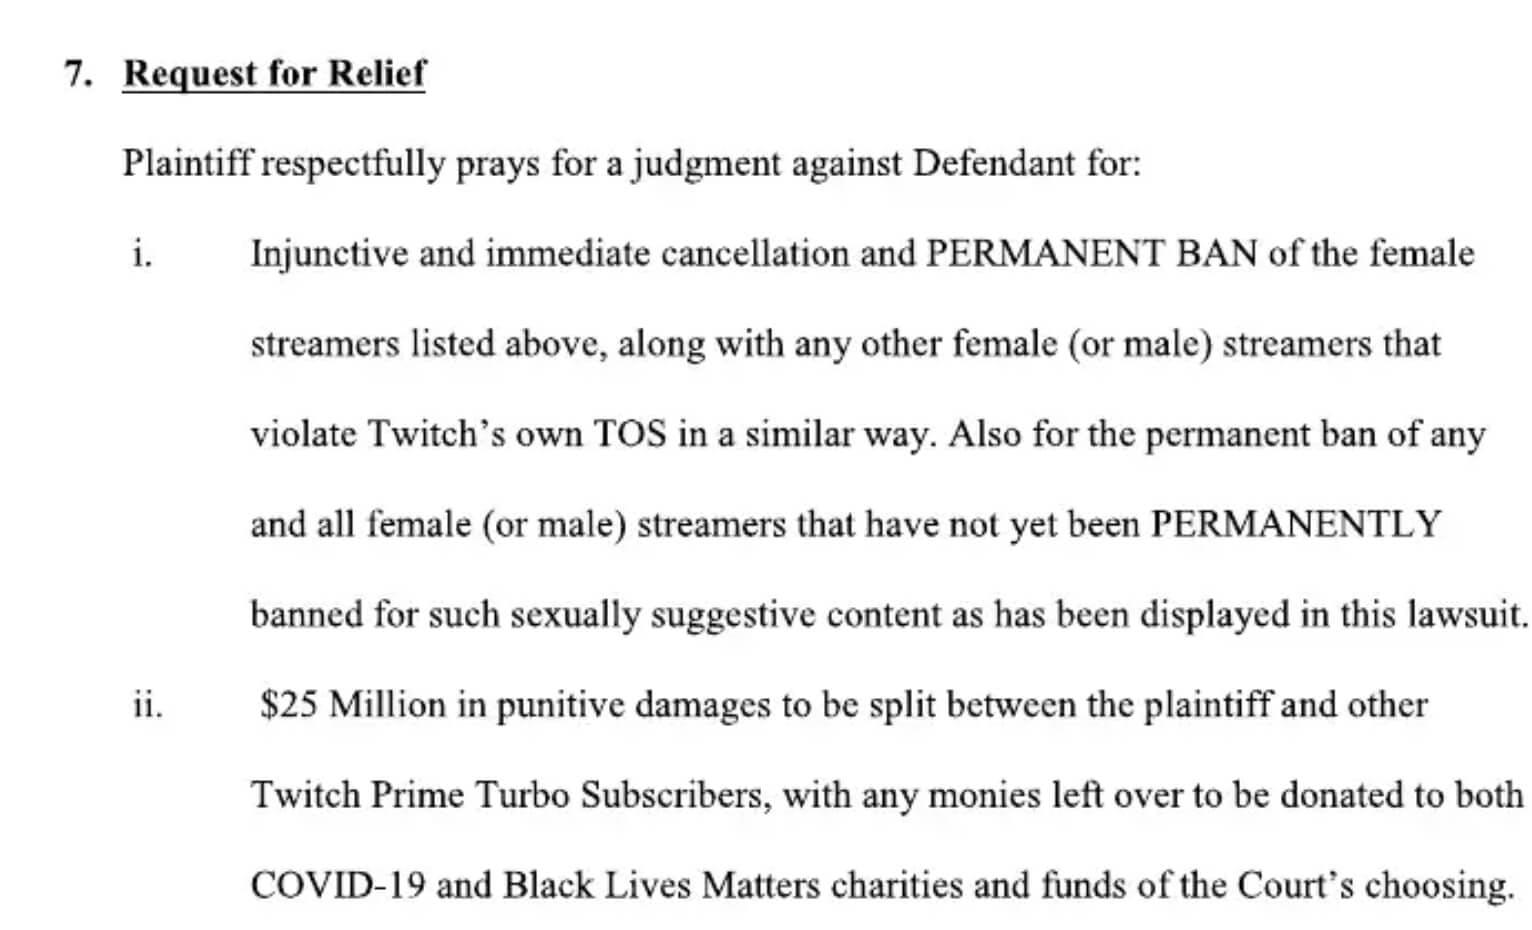 Twitch lawsuit - relief